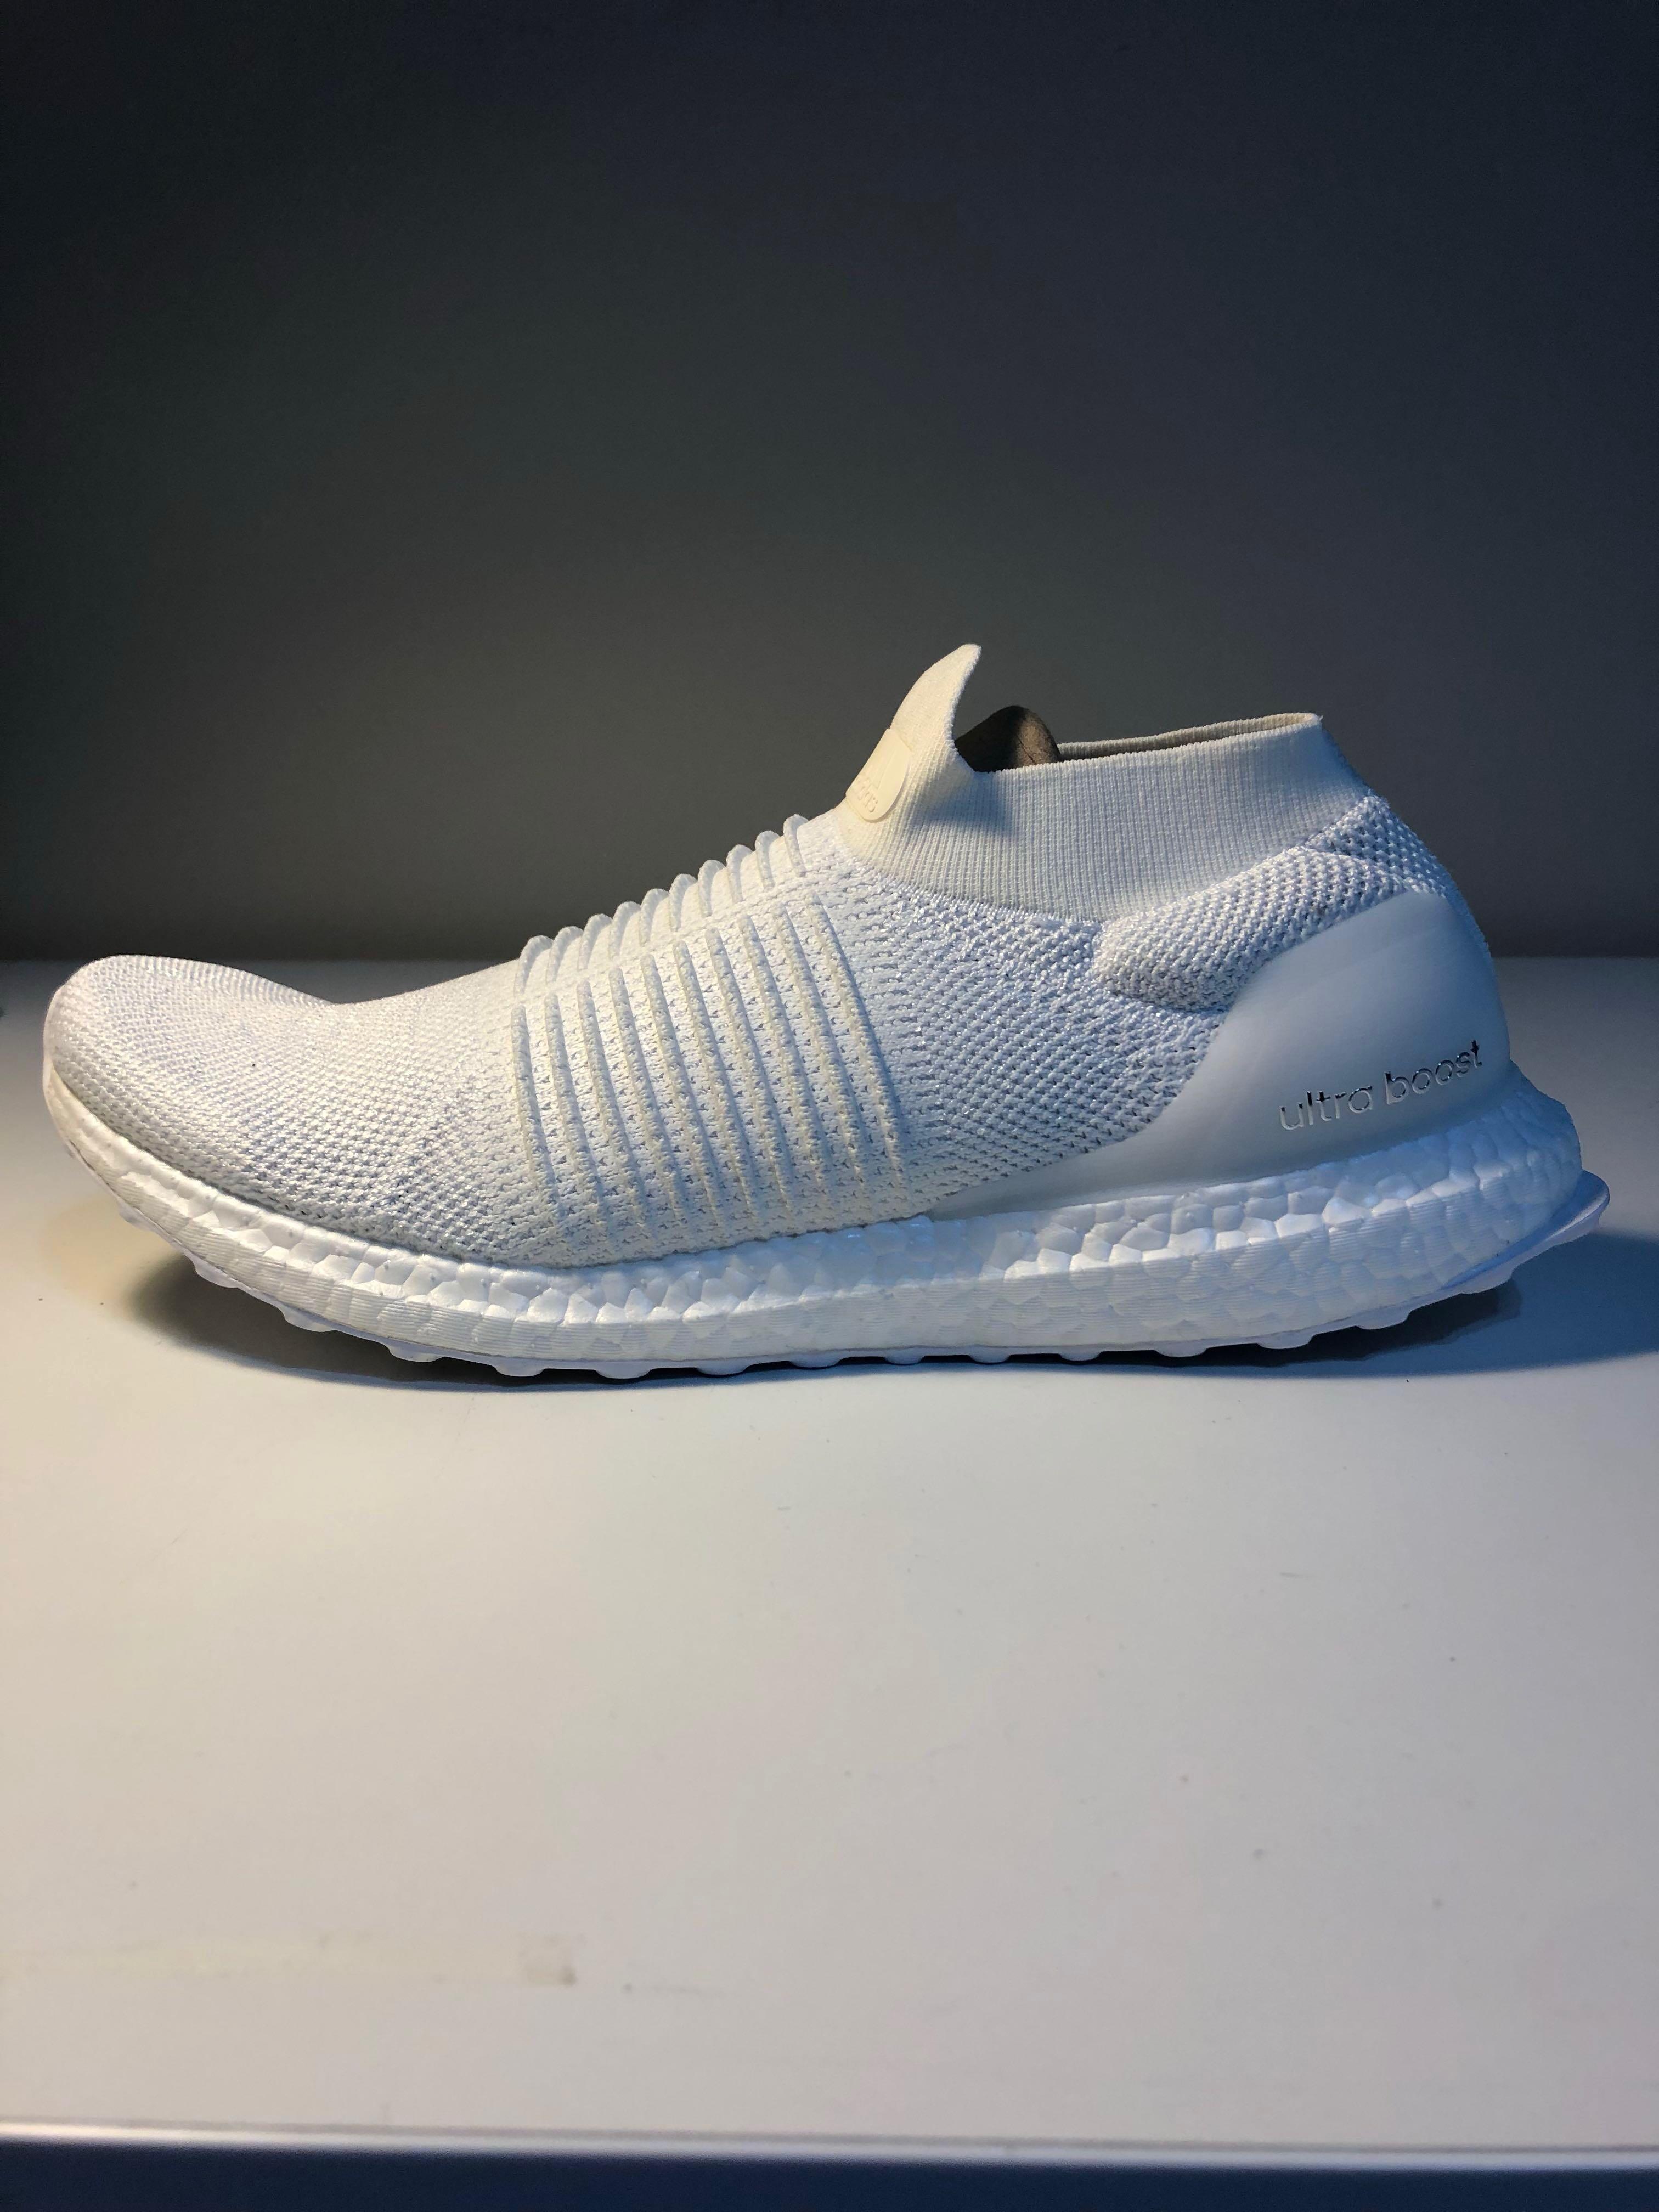 fcef2754 ADIDAS ULTRA BOOST LACELESS TRIPLE WHITE, Men's Fashion, Footwear, Sneakers  on Carousell